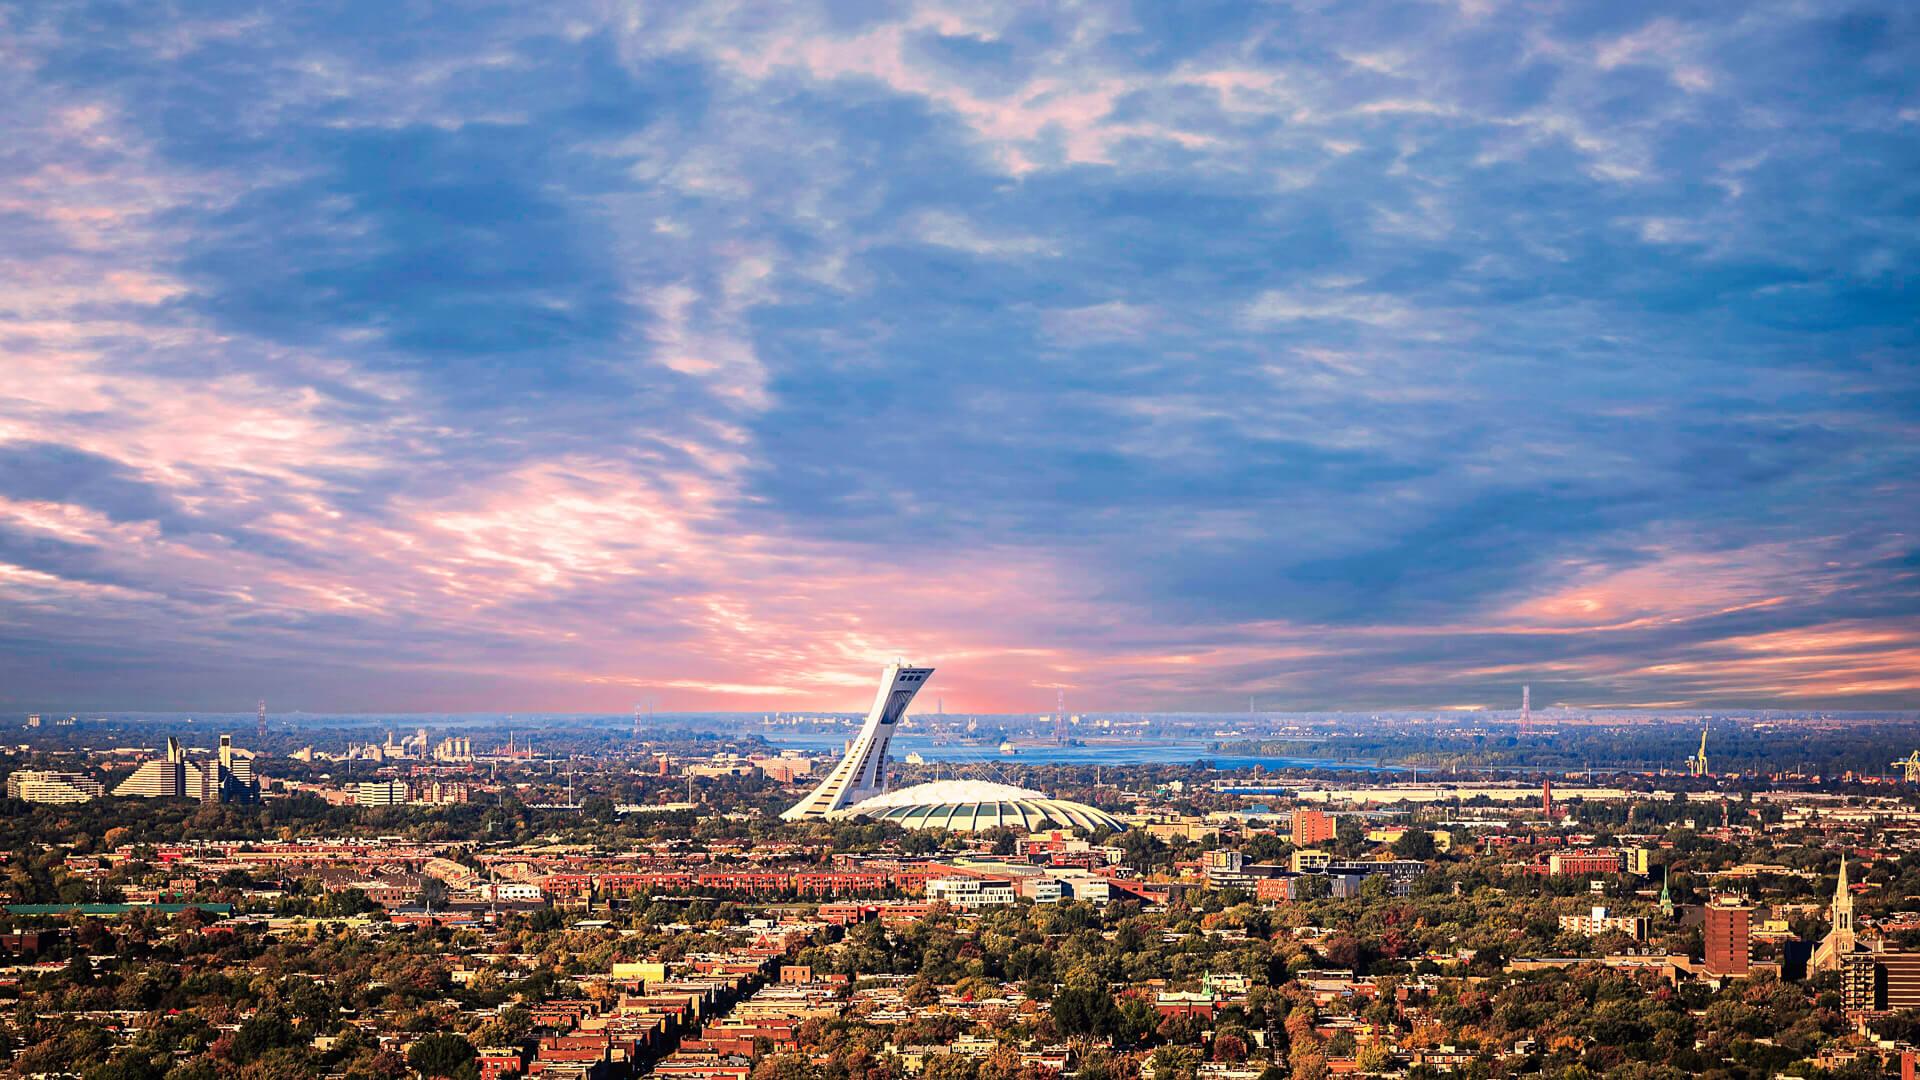 Montreal skyline in sunset.